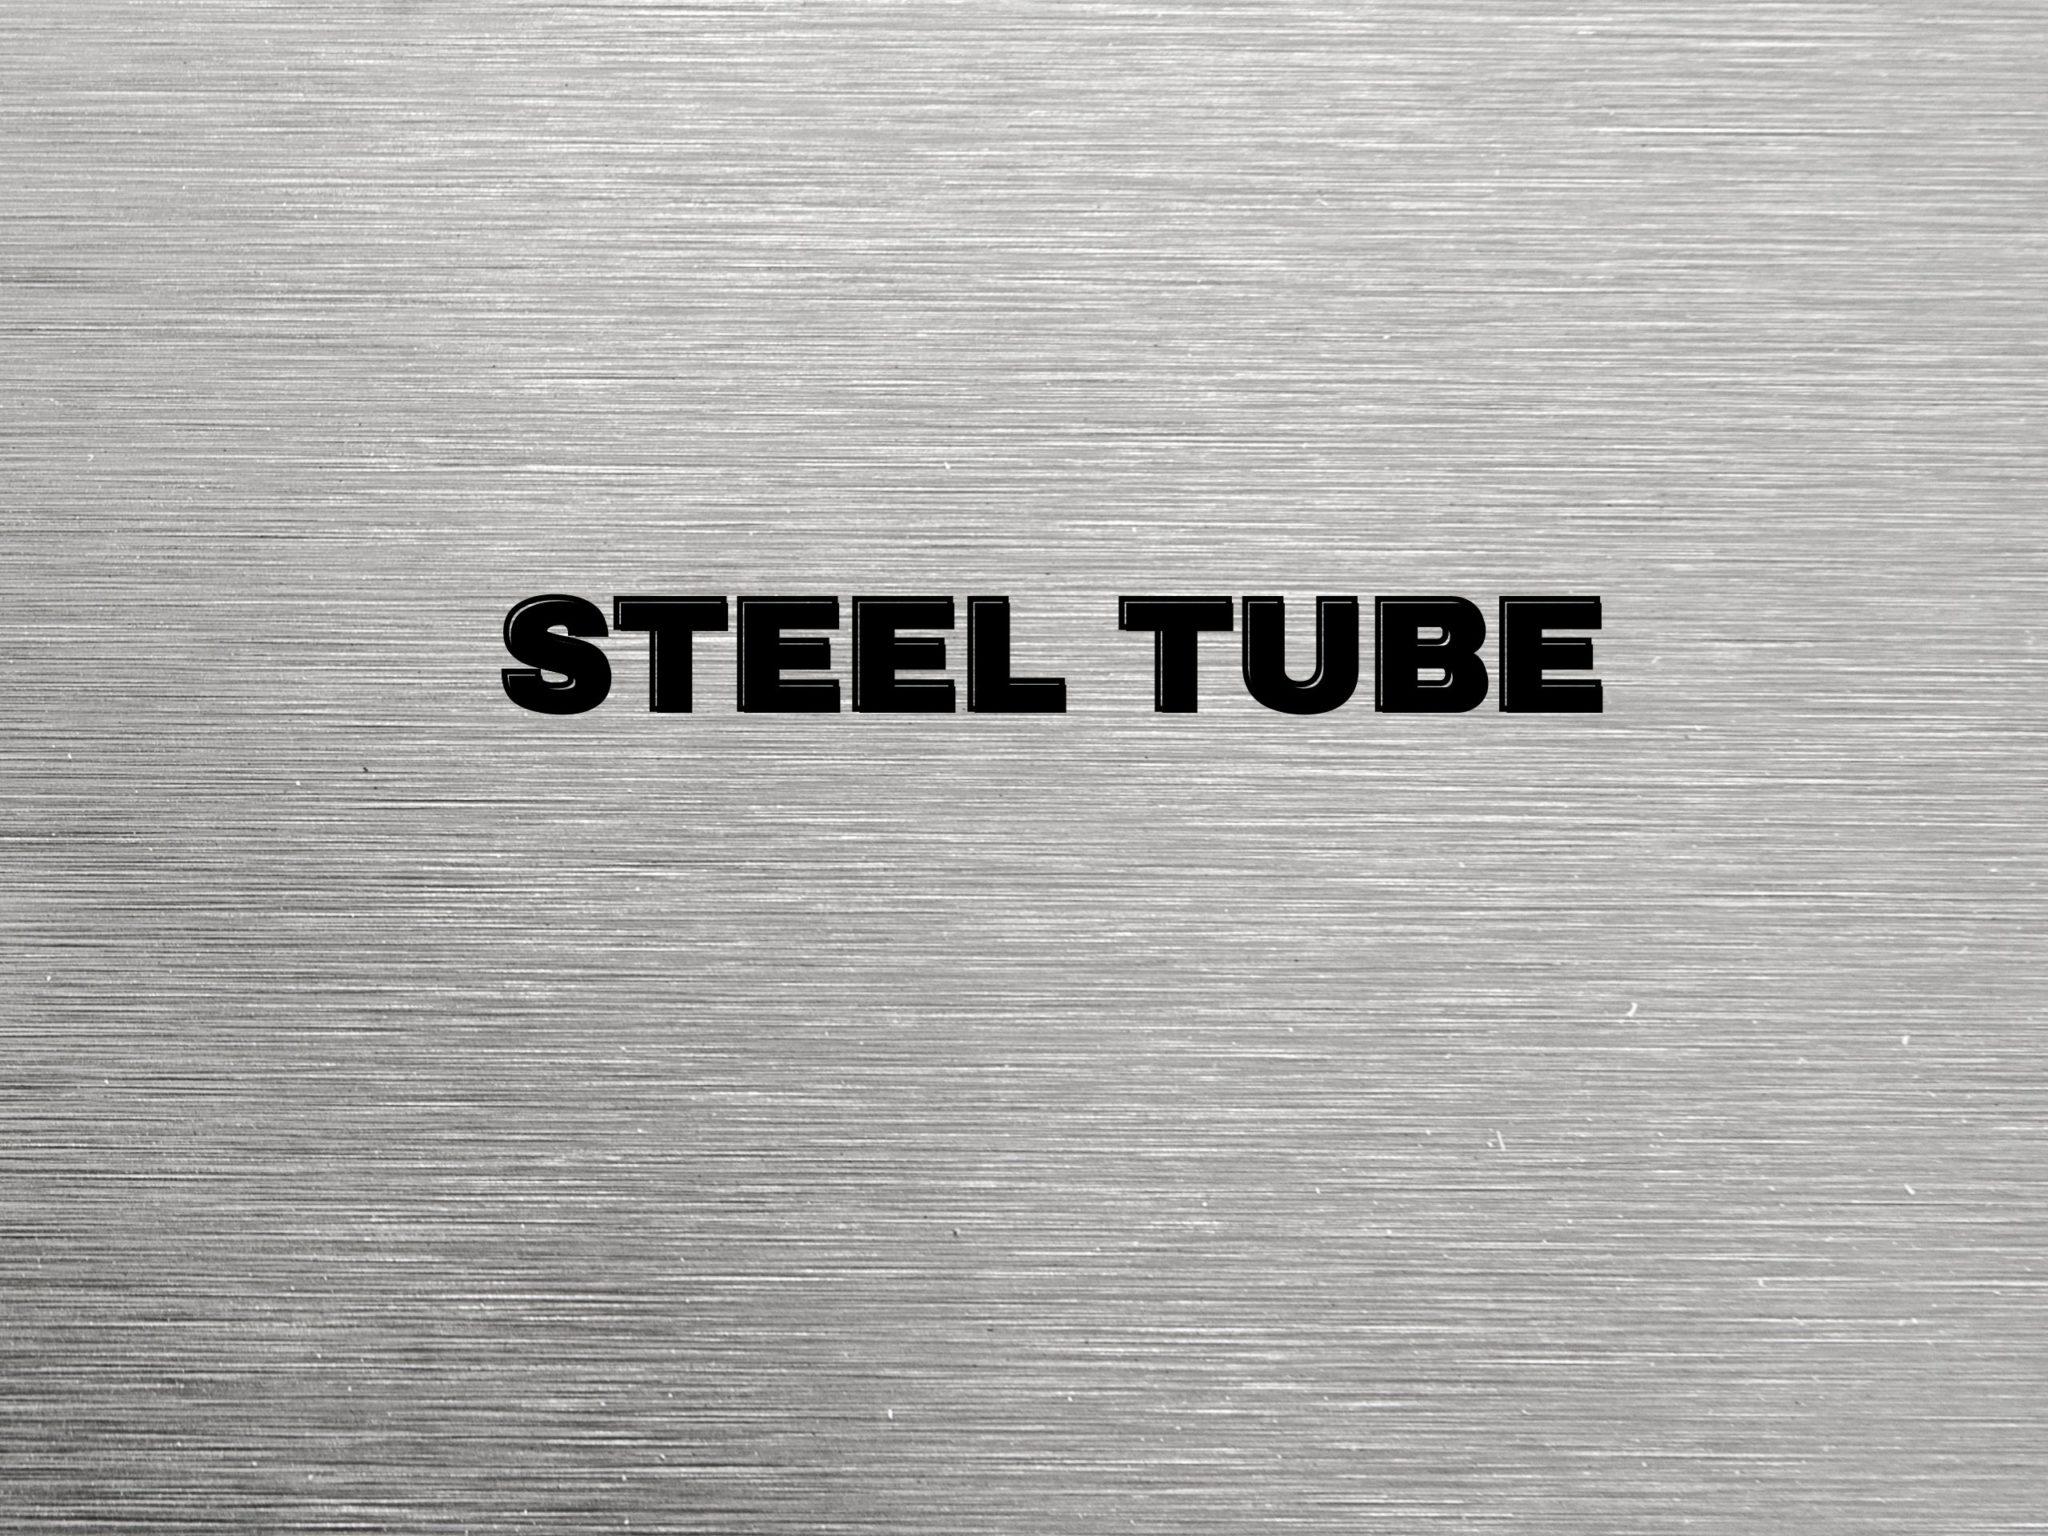 Square Steel Tube 1 x 1 x 3/16 x 64-68 Long - Kooima